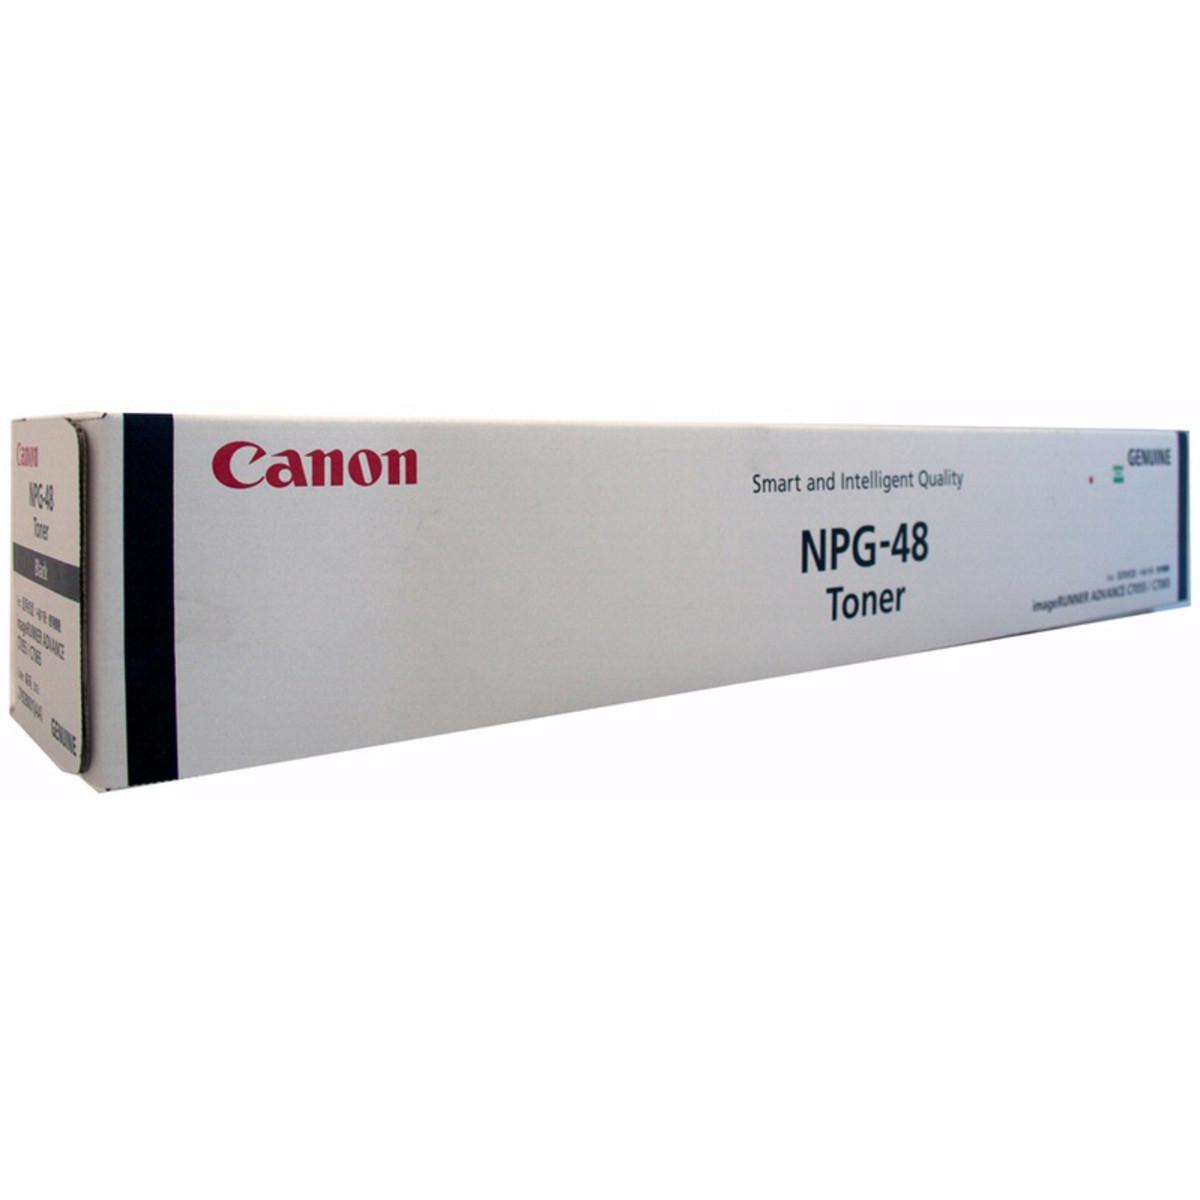 Canon NGP-48 Black Copier Cartridge